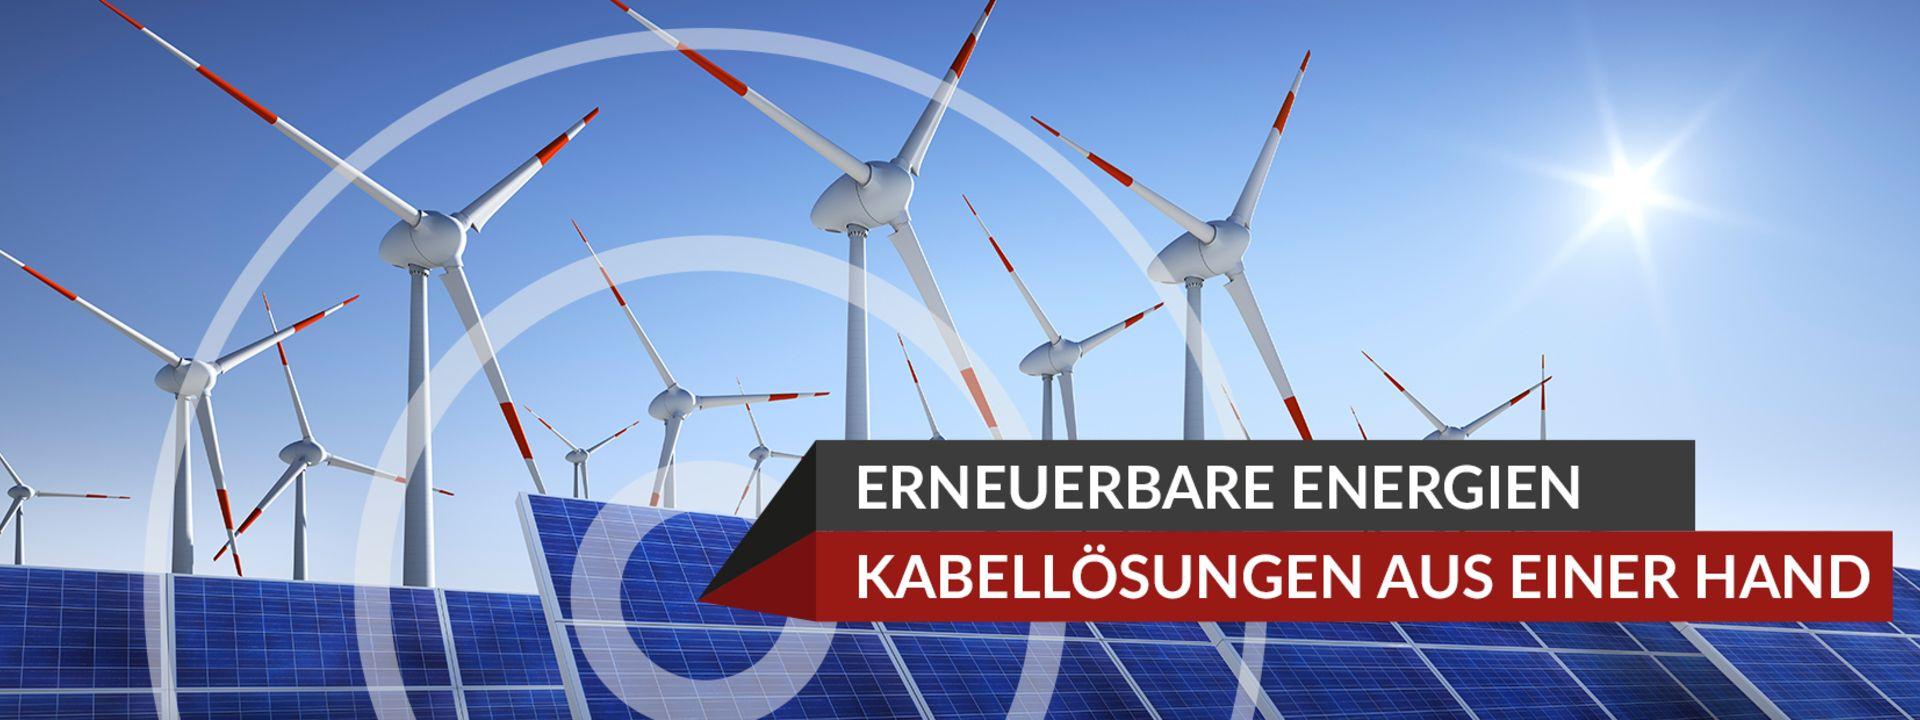 Hunstock Kabel GmbH